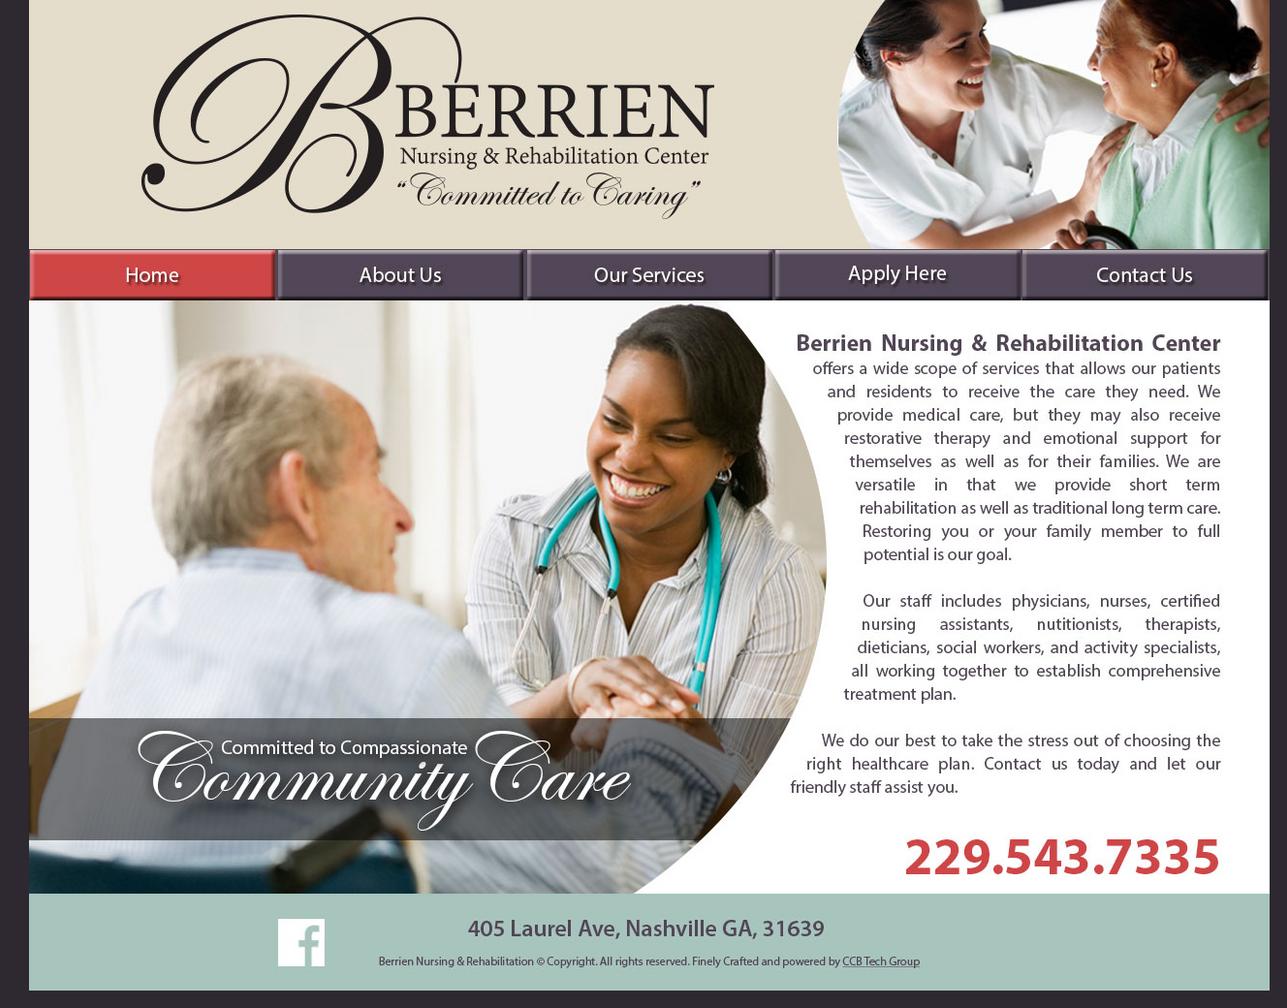 Berrien Nursing & Rehabilitation